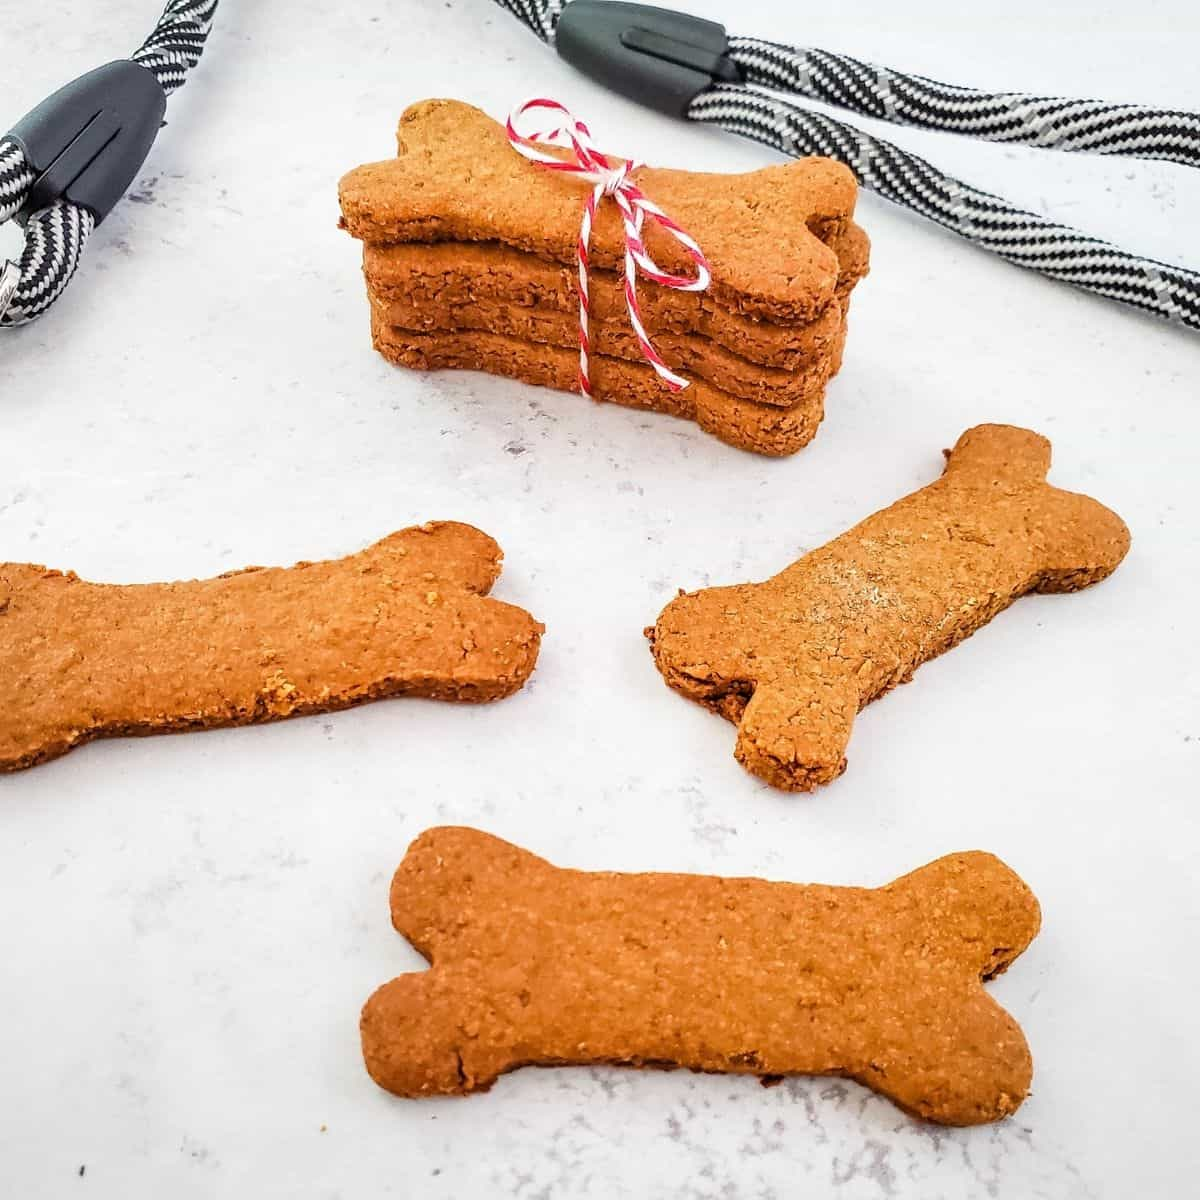 carrot and oatmeal dog treats